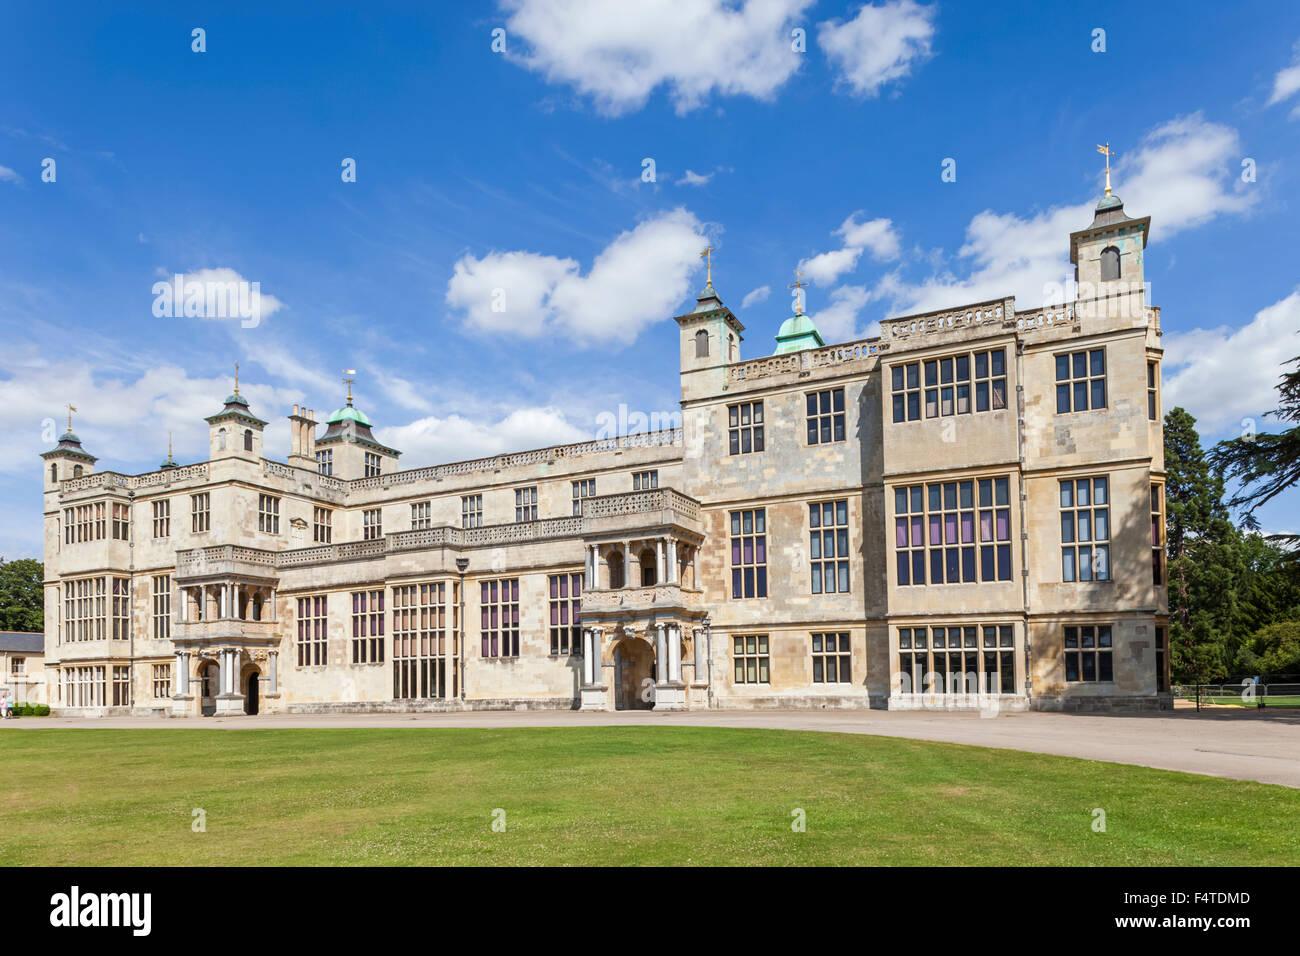 England, Essex, Saffron Walden, Audley End House - Stock Image